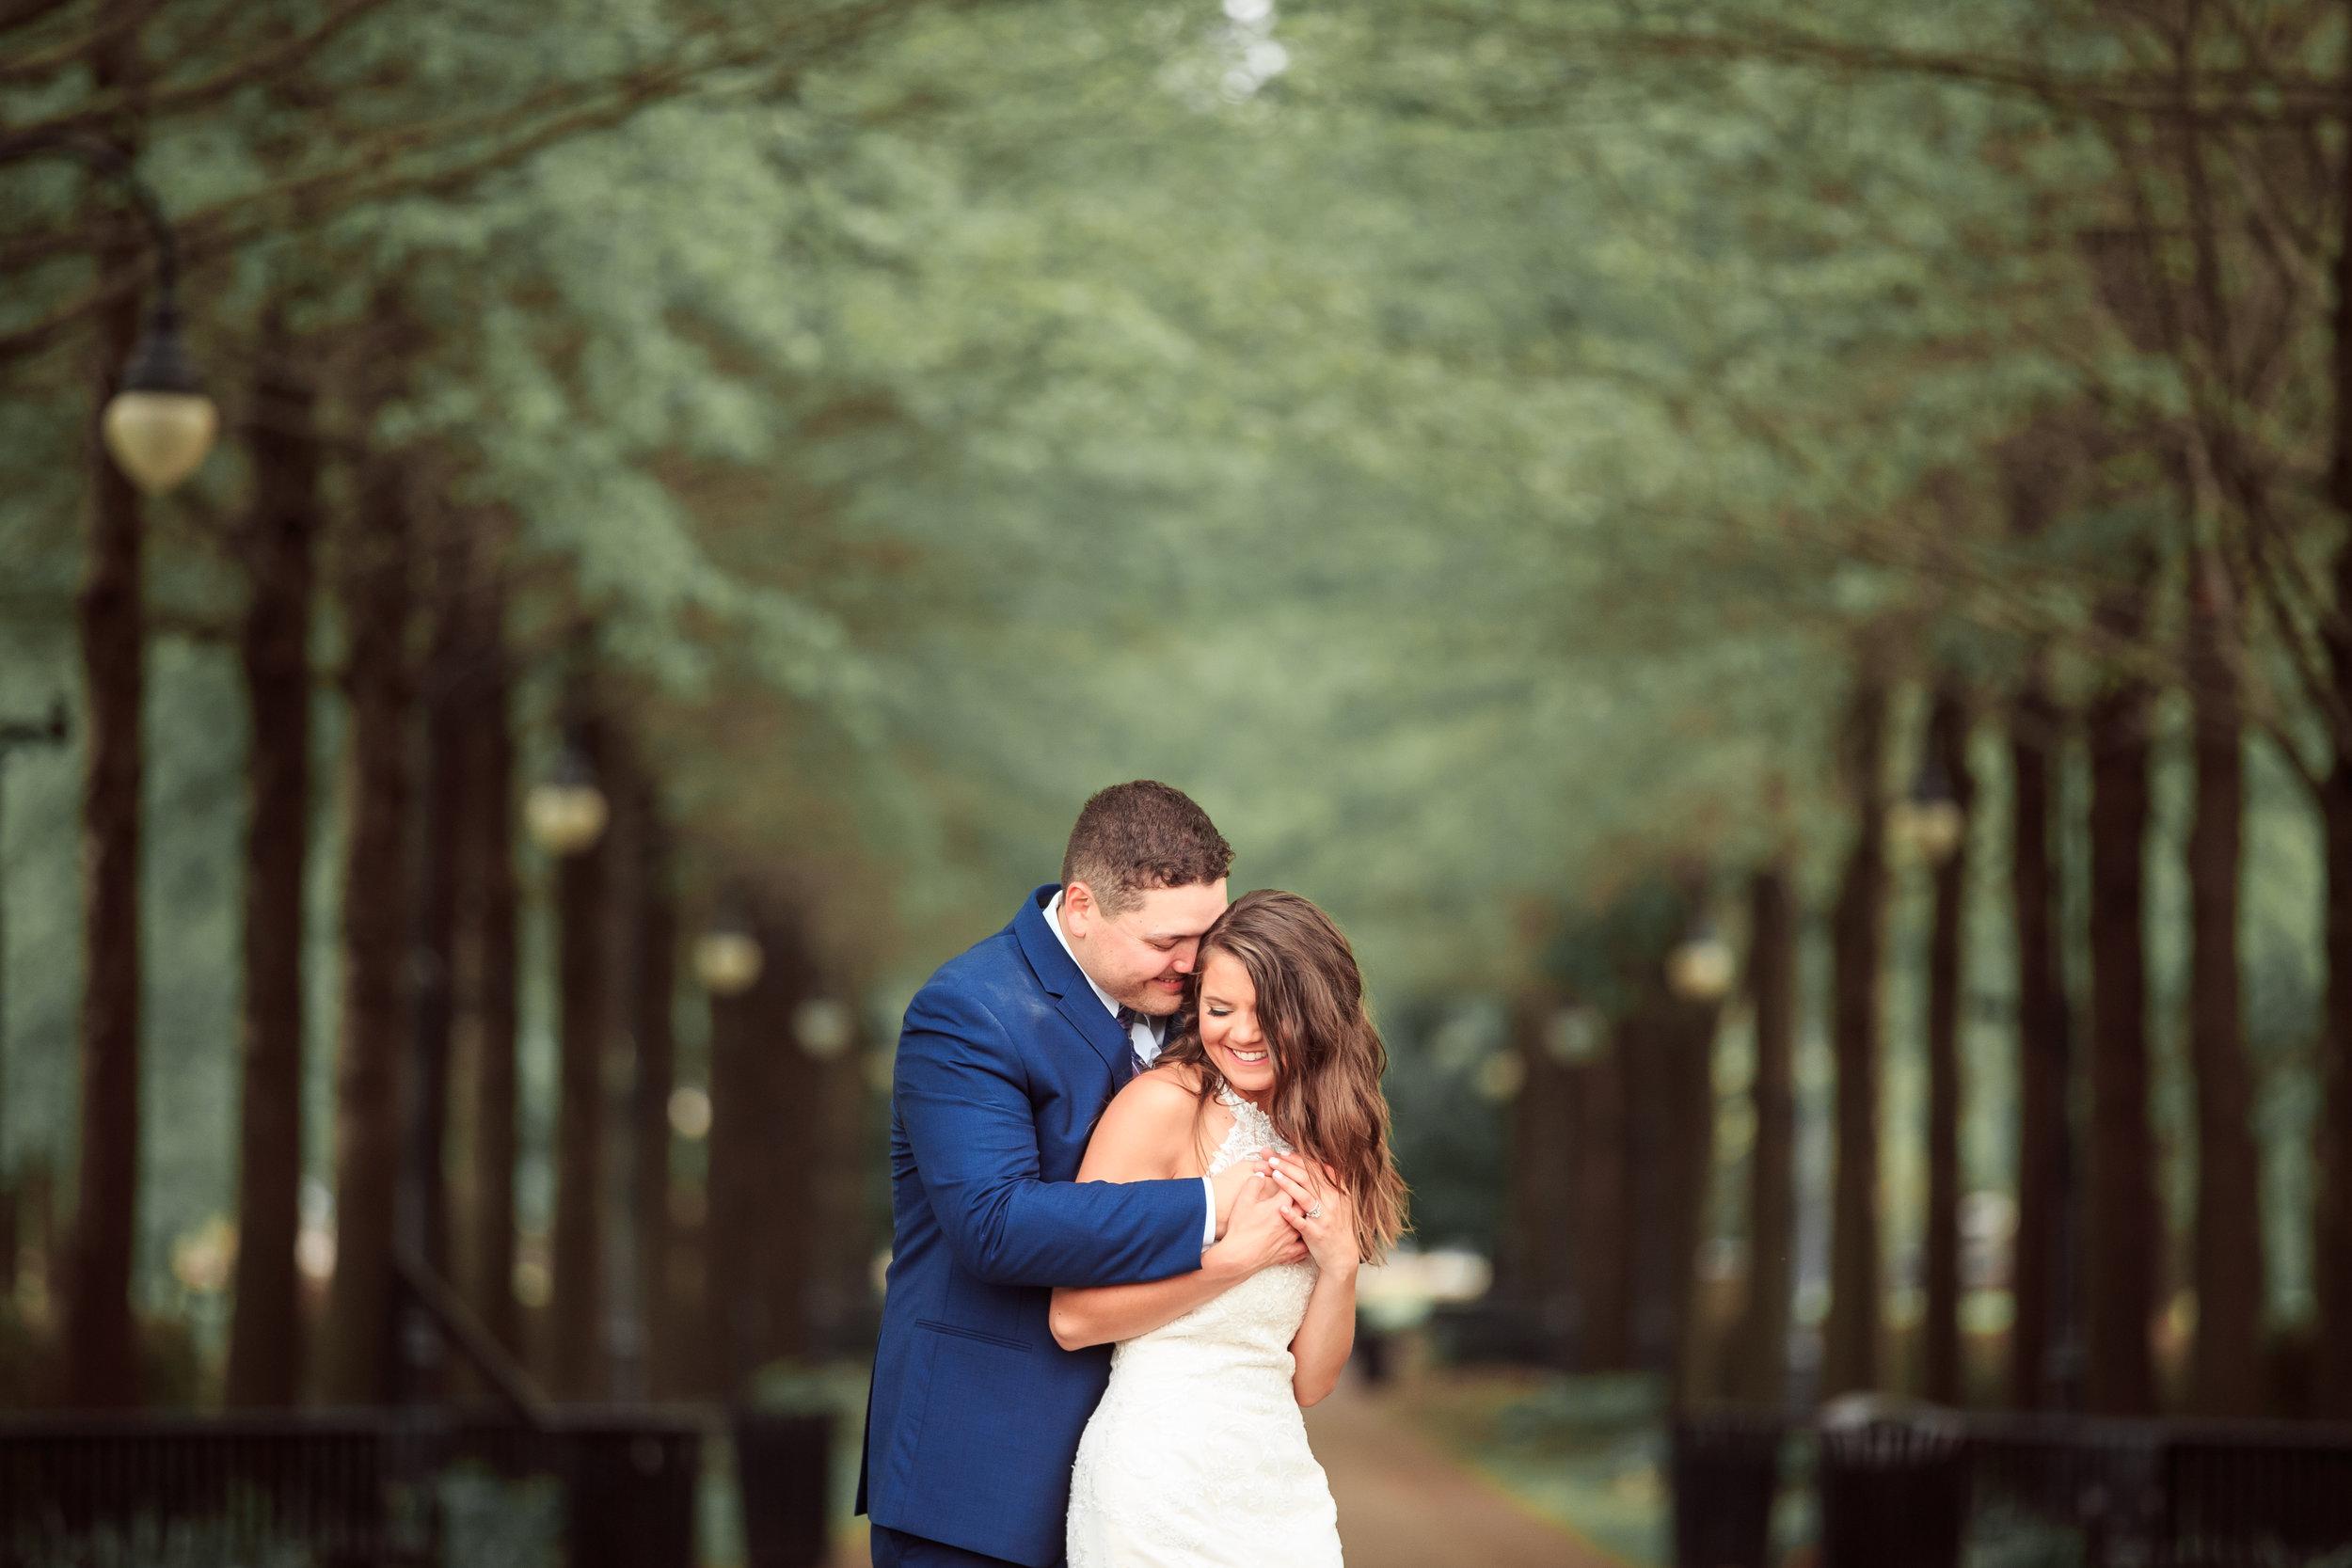 Cute-wedding-pose-in-davenport-iowa.jpg